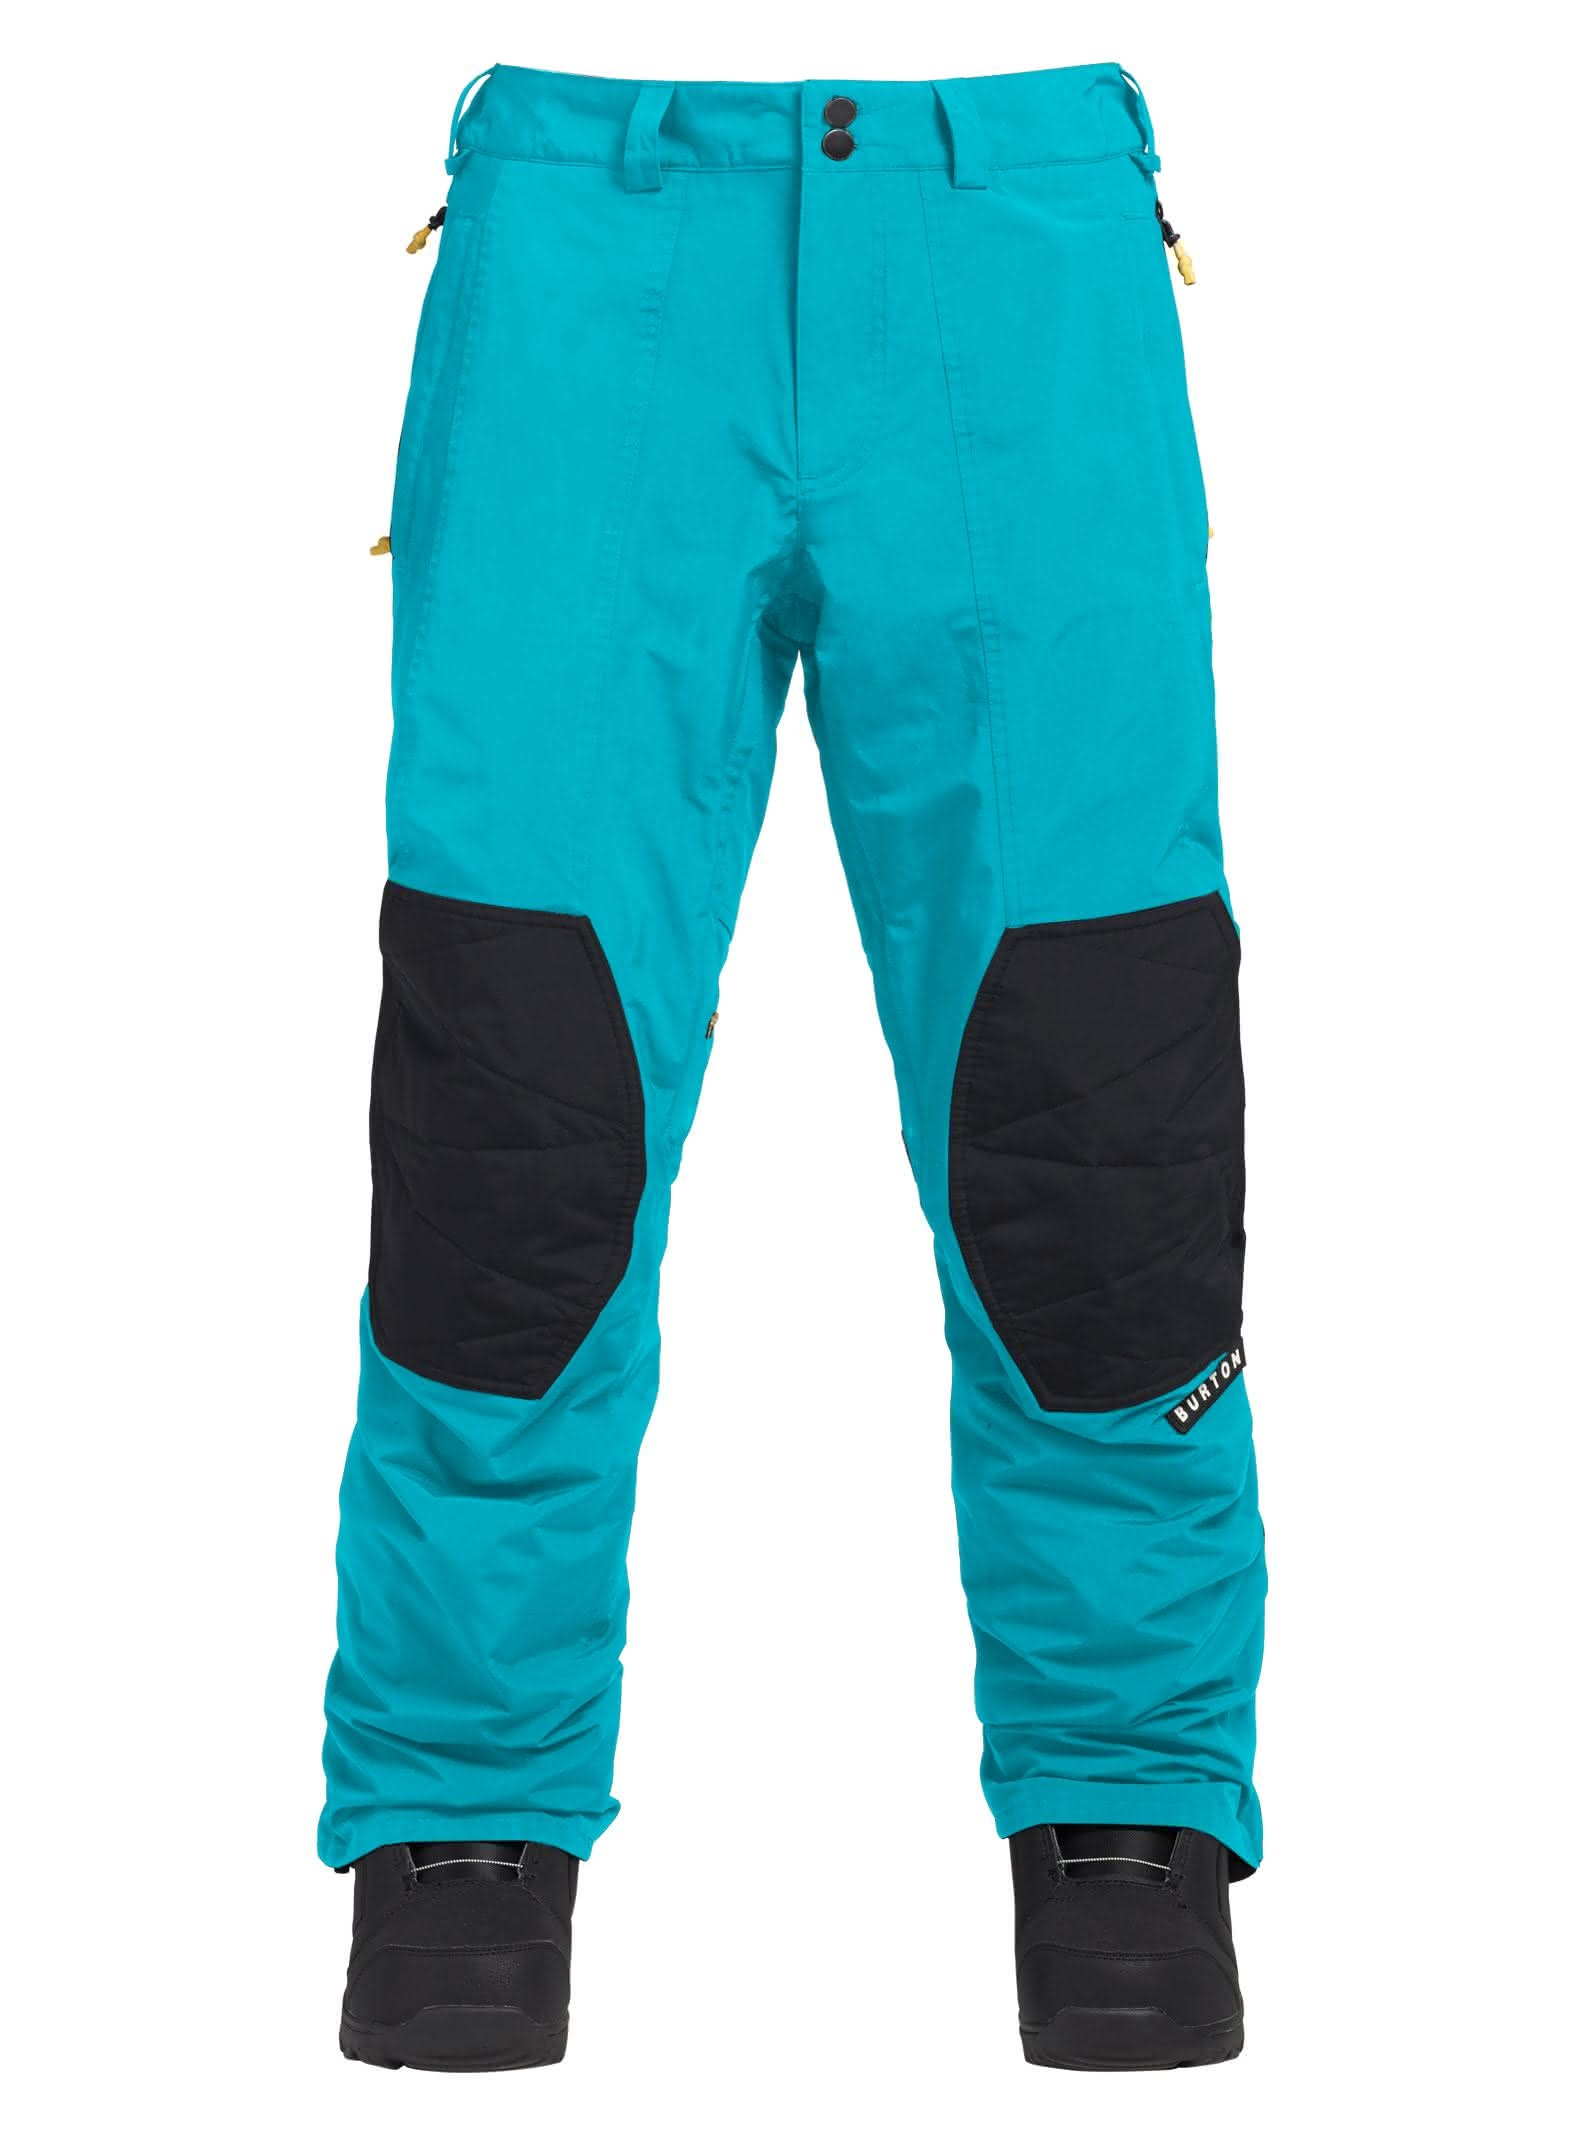 Spodnie Snowboardowe Burton Retro Pant (Tahoe / True Black) W19